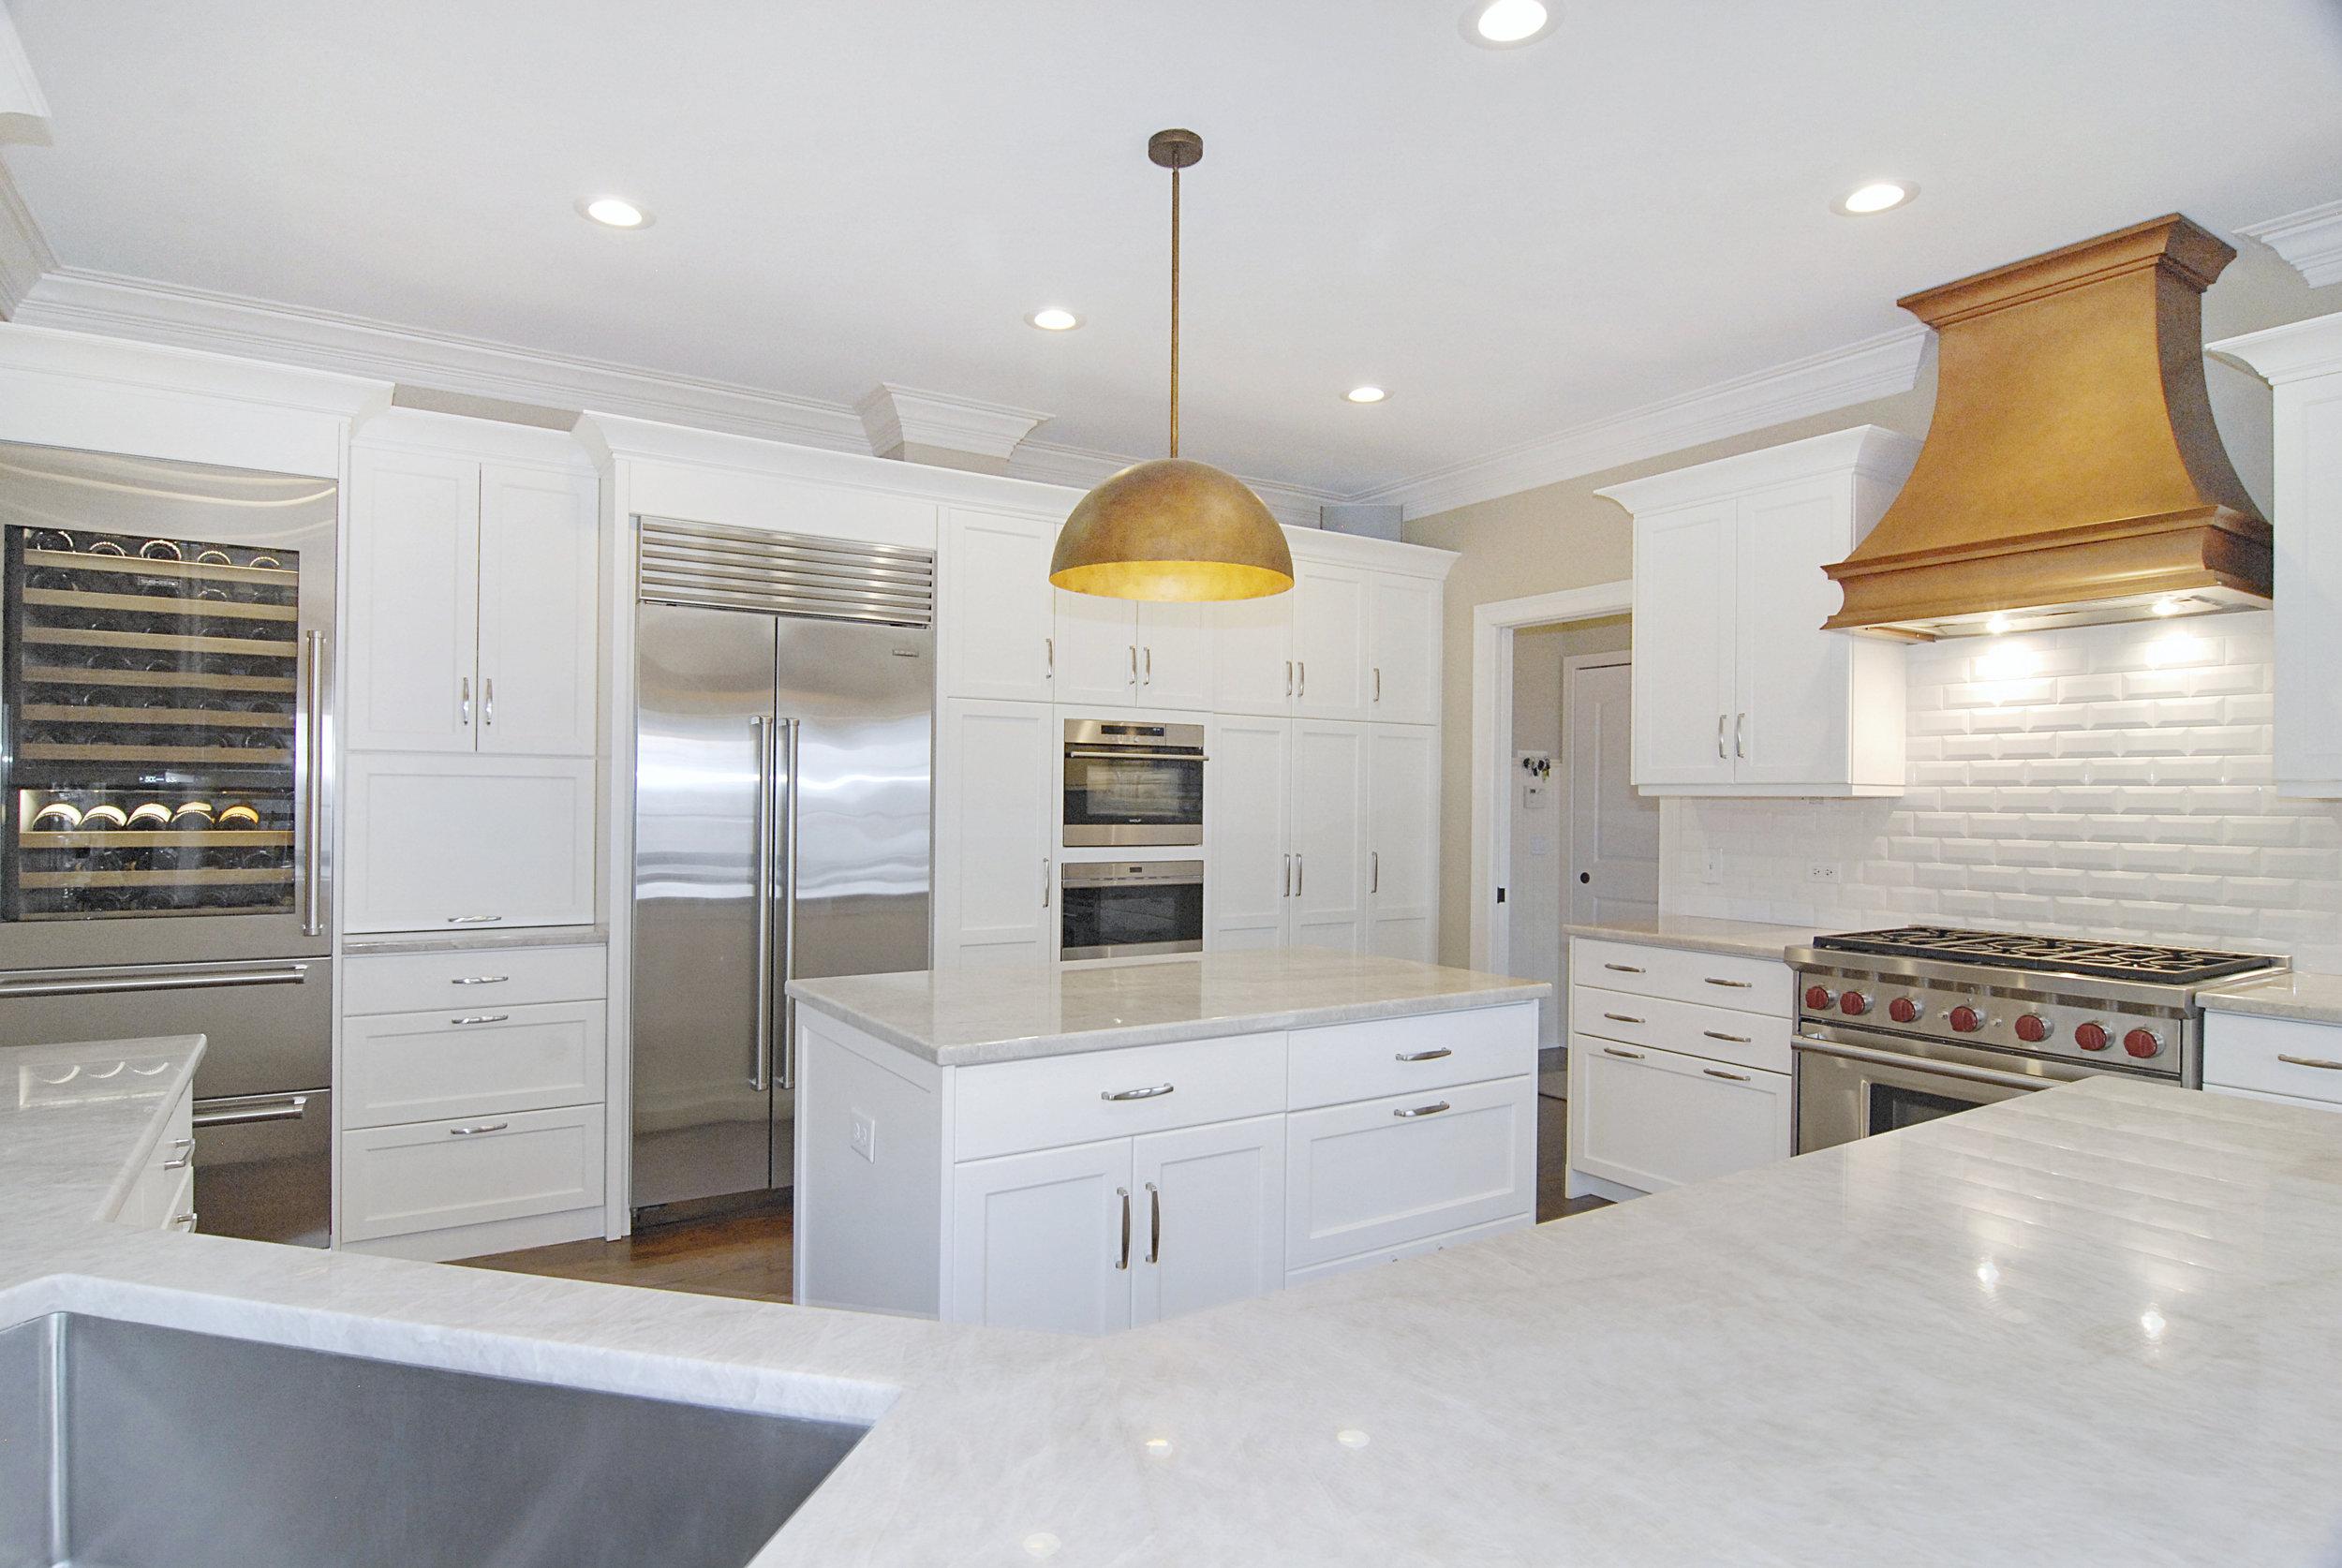 Custom Kitchen Remodel with Copper Hood & Iceberg Quartzite